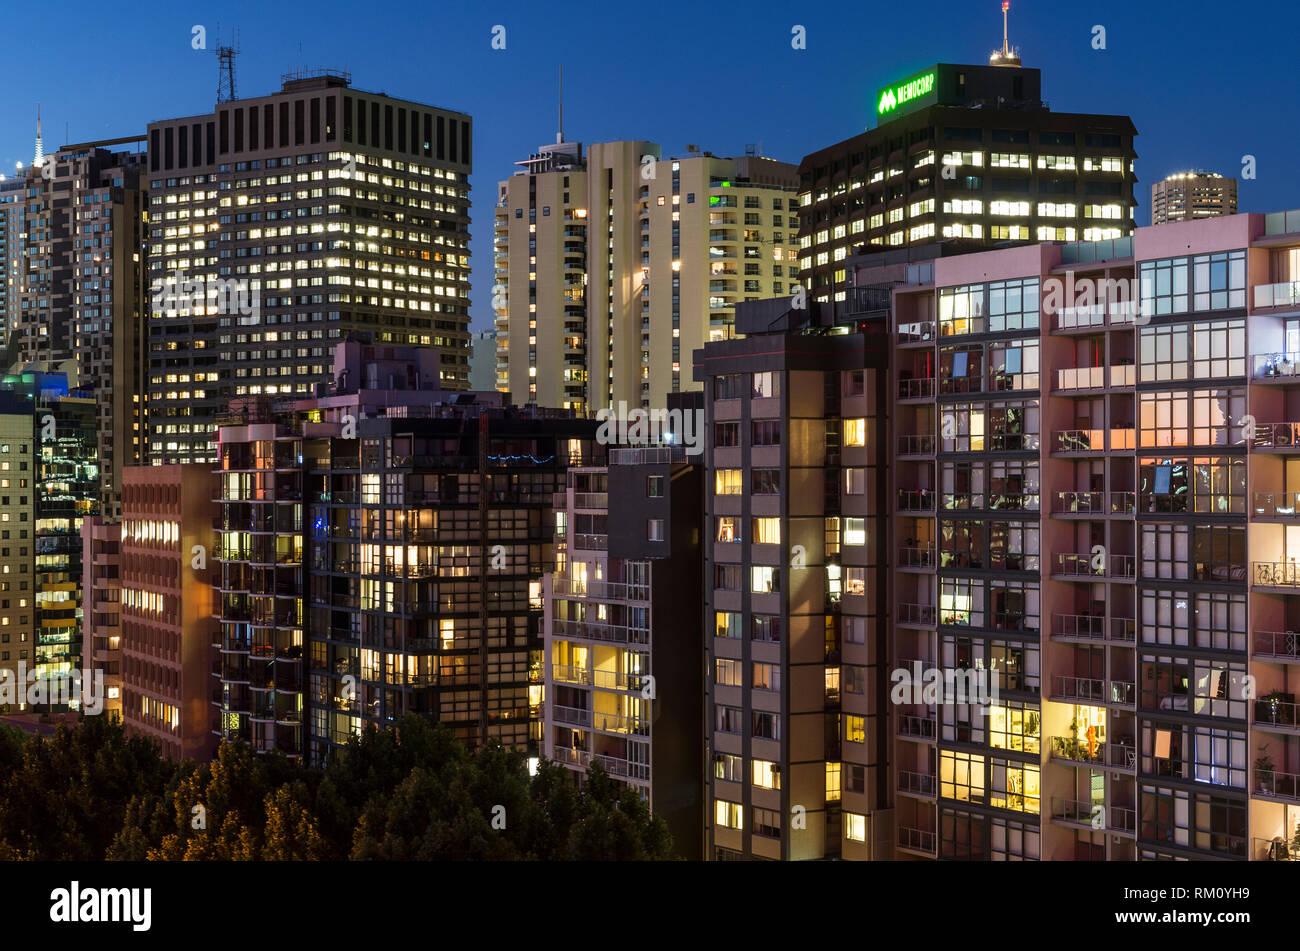 Night architecture in Sydney. Stock Photo